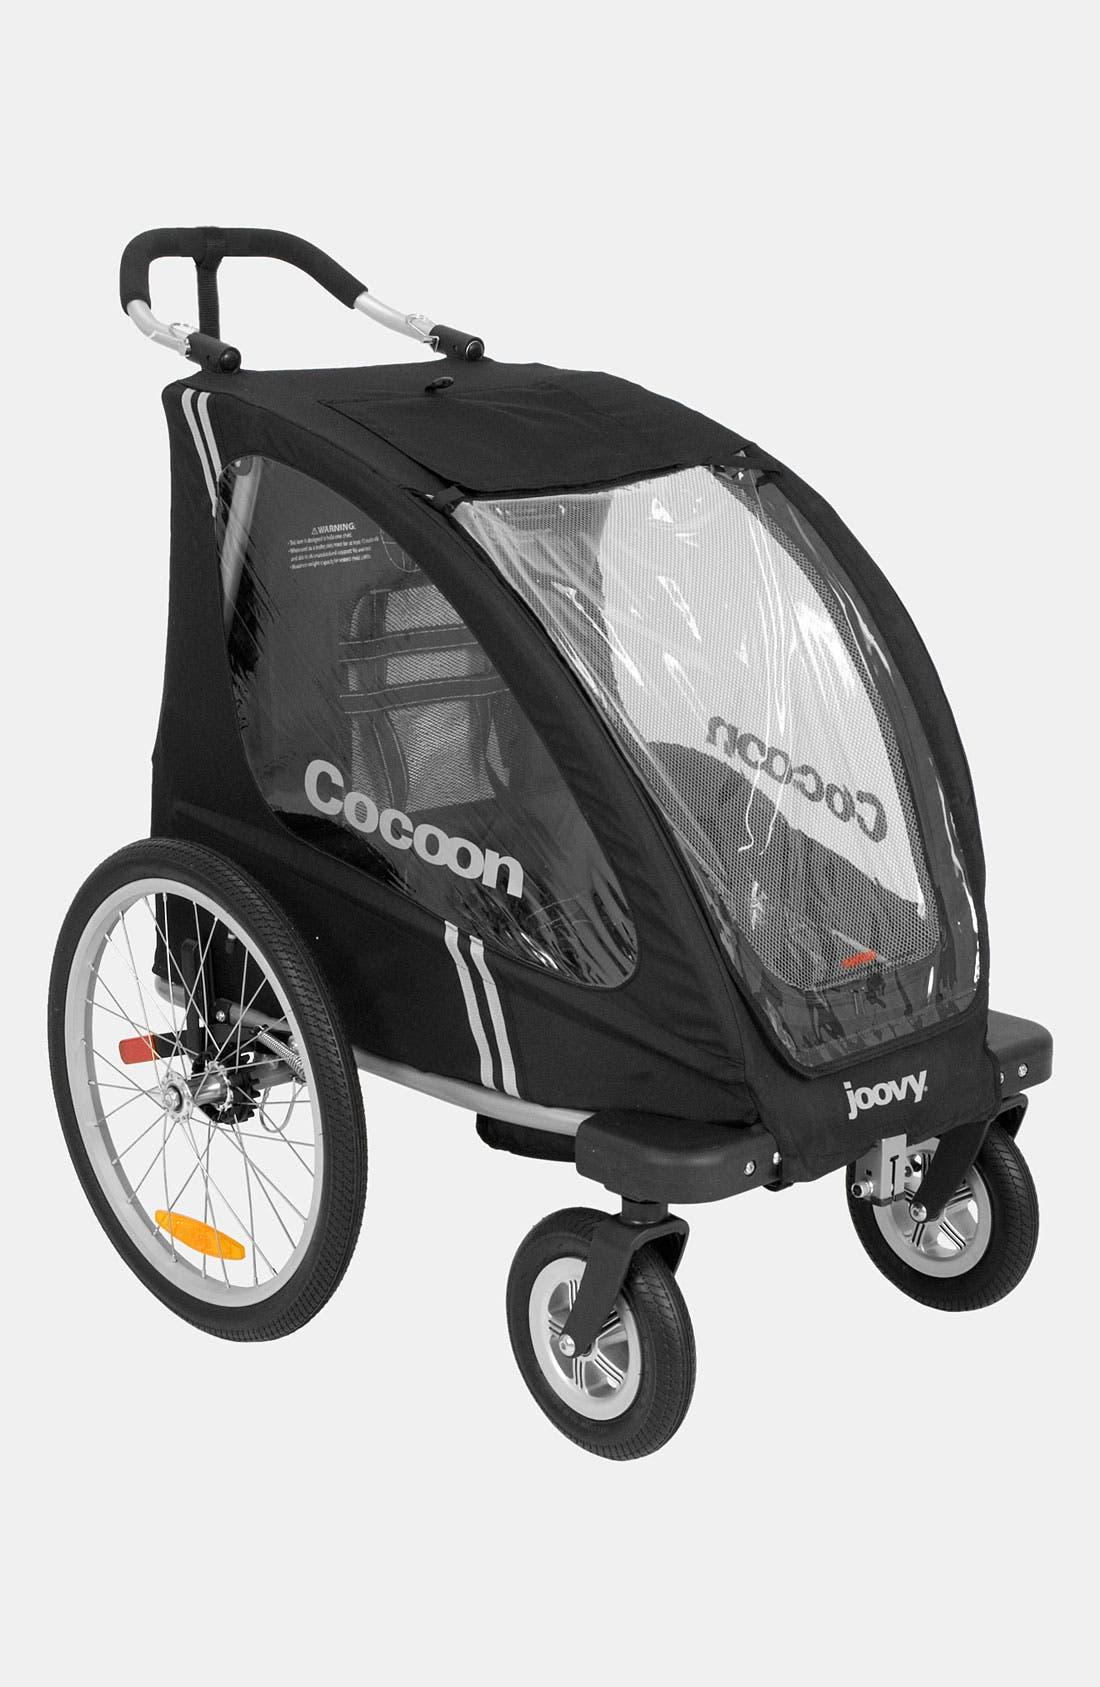 Alternate Image 1 Selected - Joovy 'Cocoon' Single Stroller